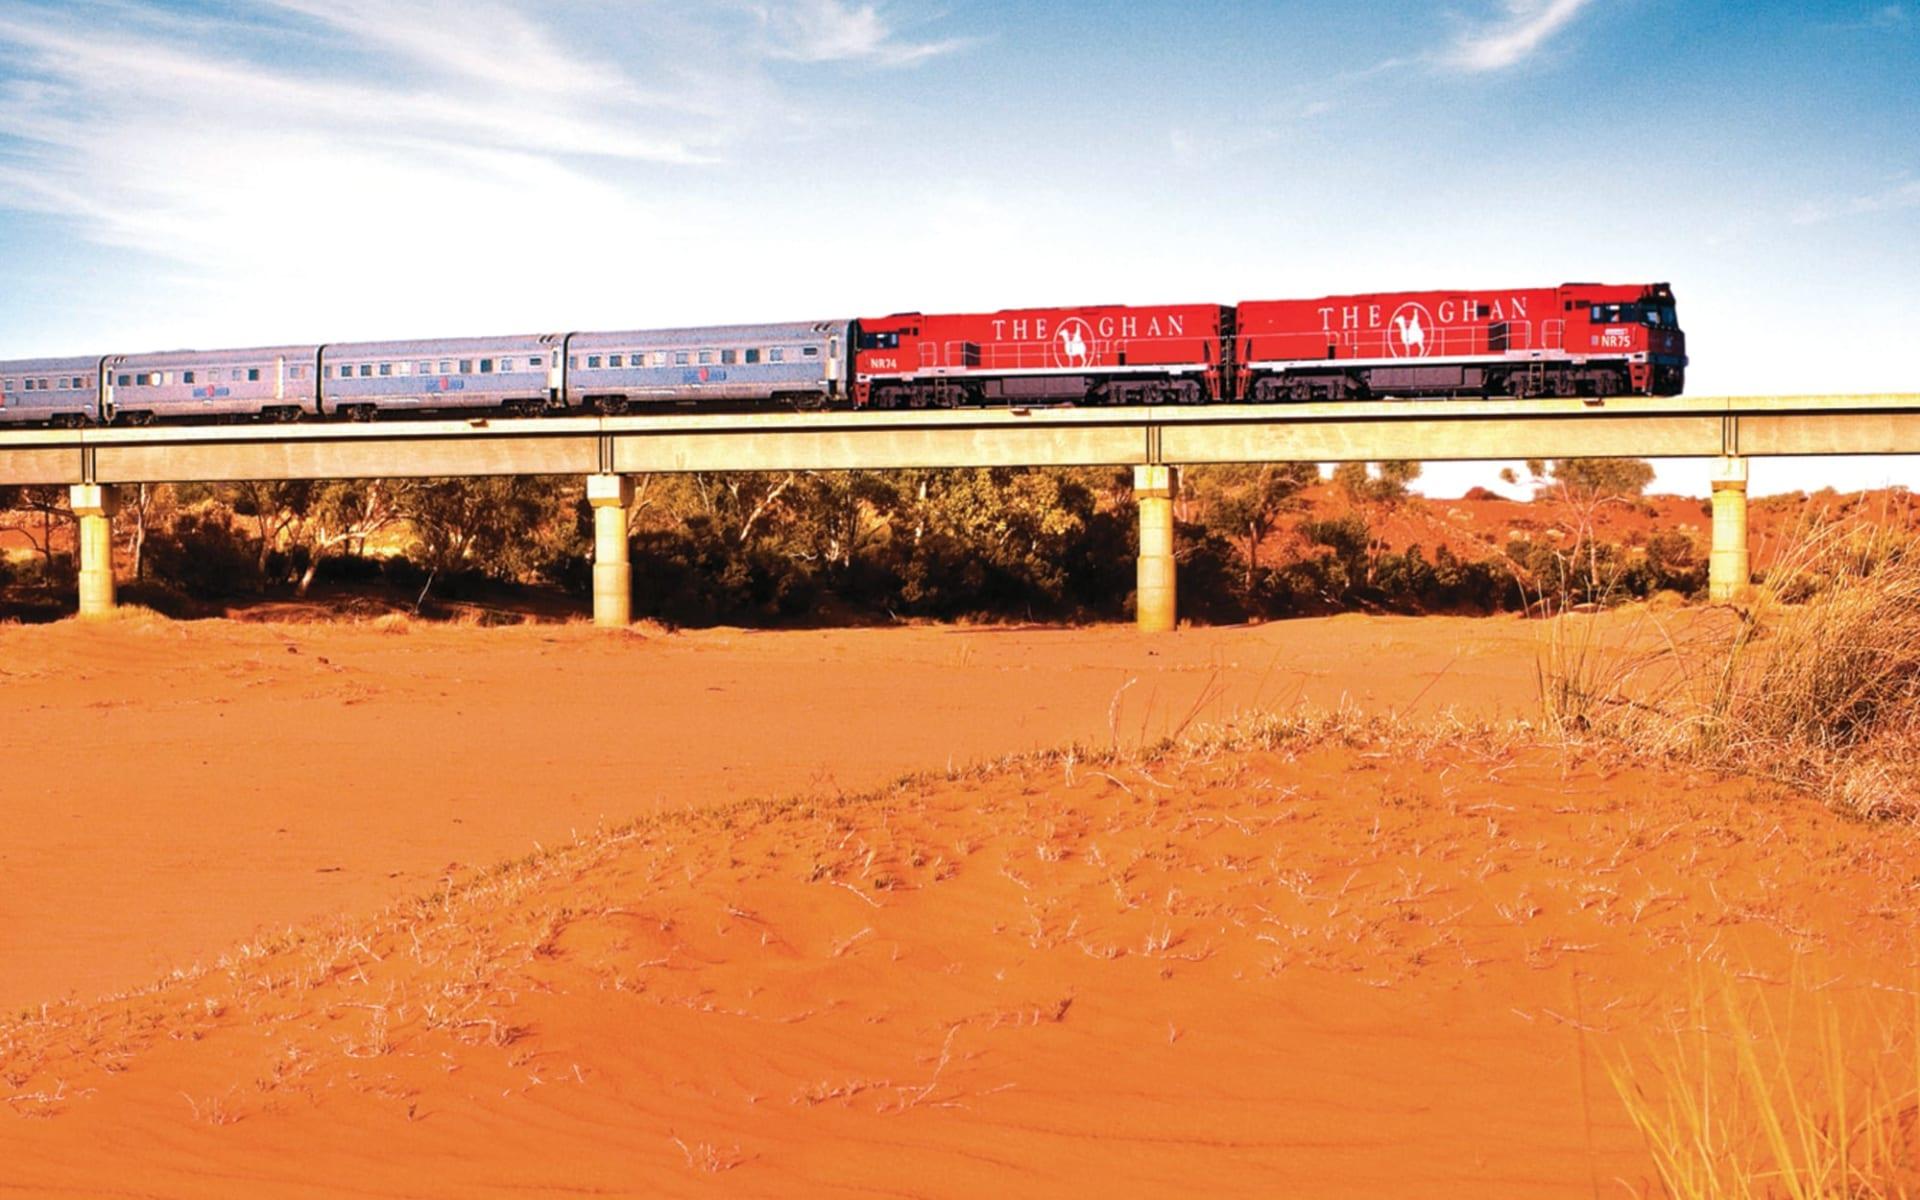 The Ghan - Expedition ab Darwin: Australien - Bahnreisen - The Ghan auf Brücke